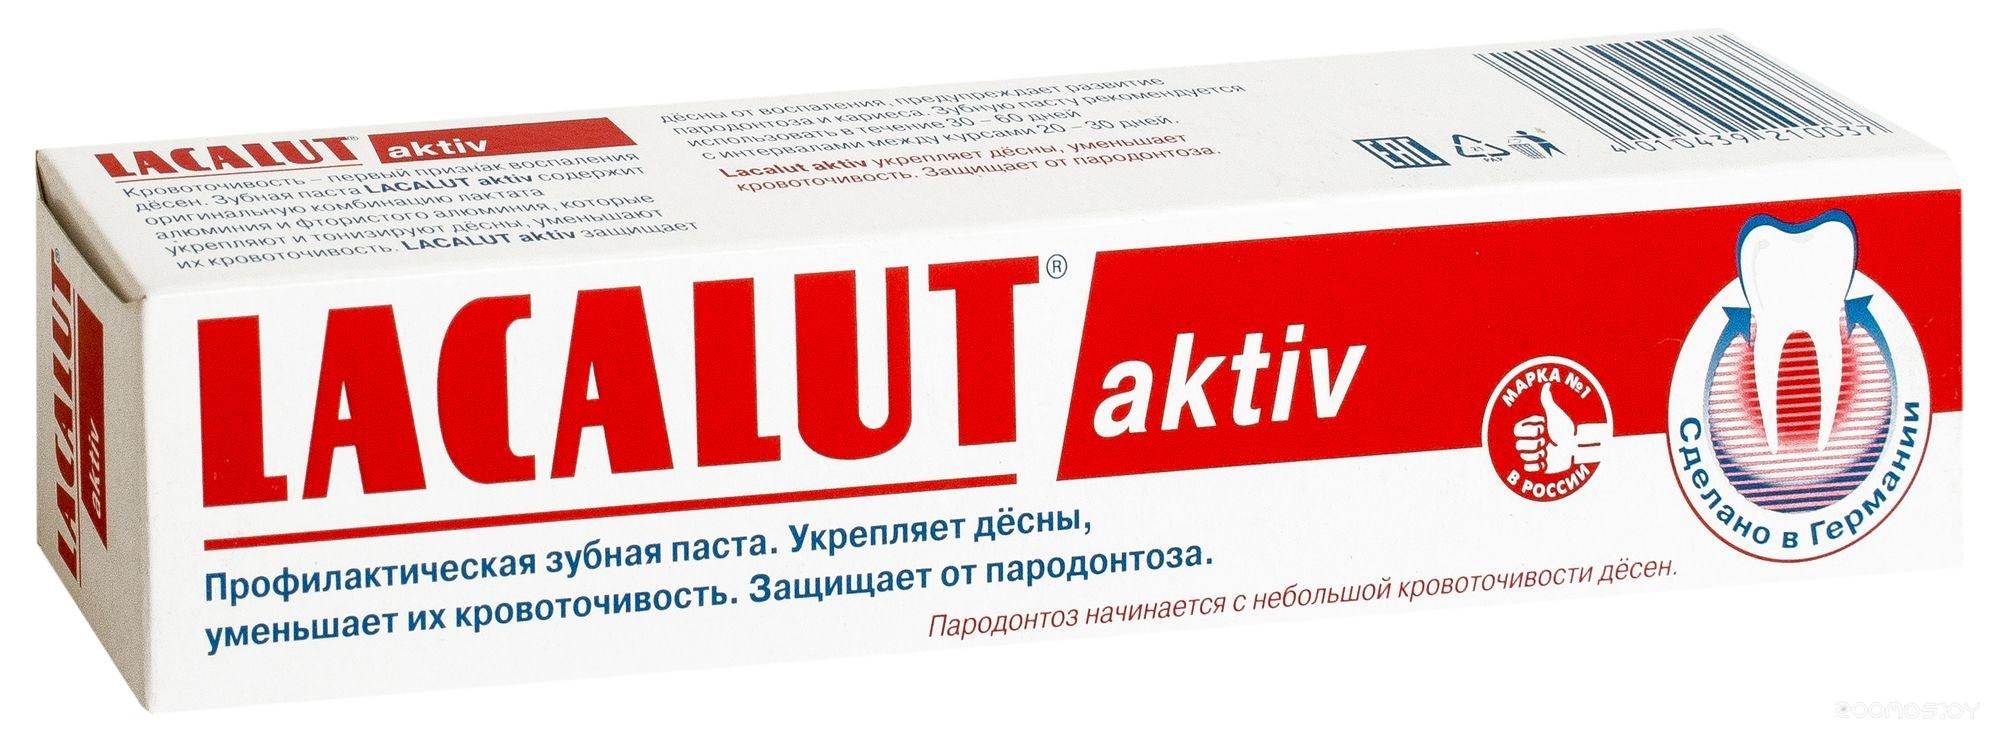 Зубная паста Lacalut Aktiv 75 мл